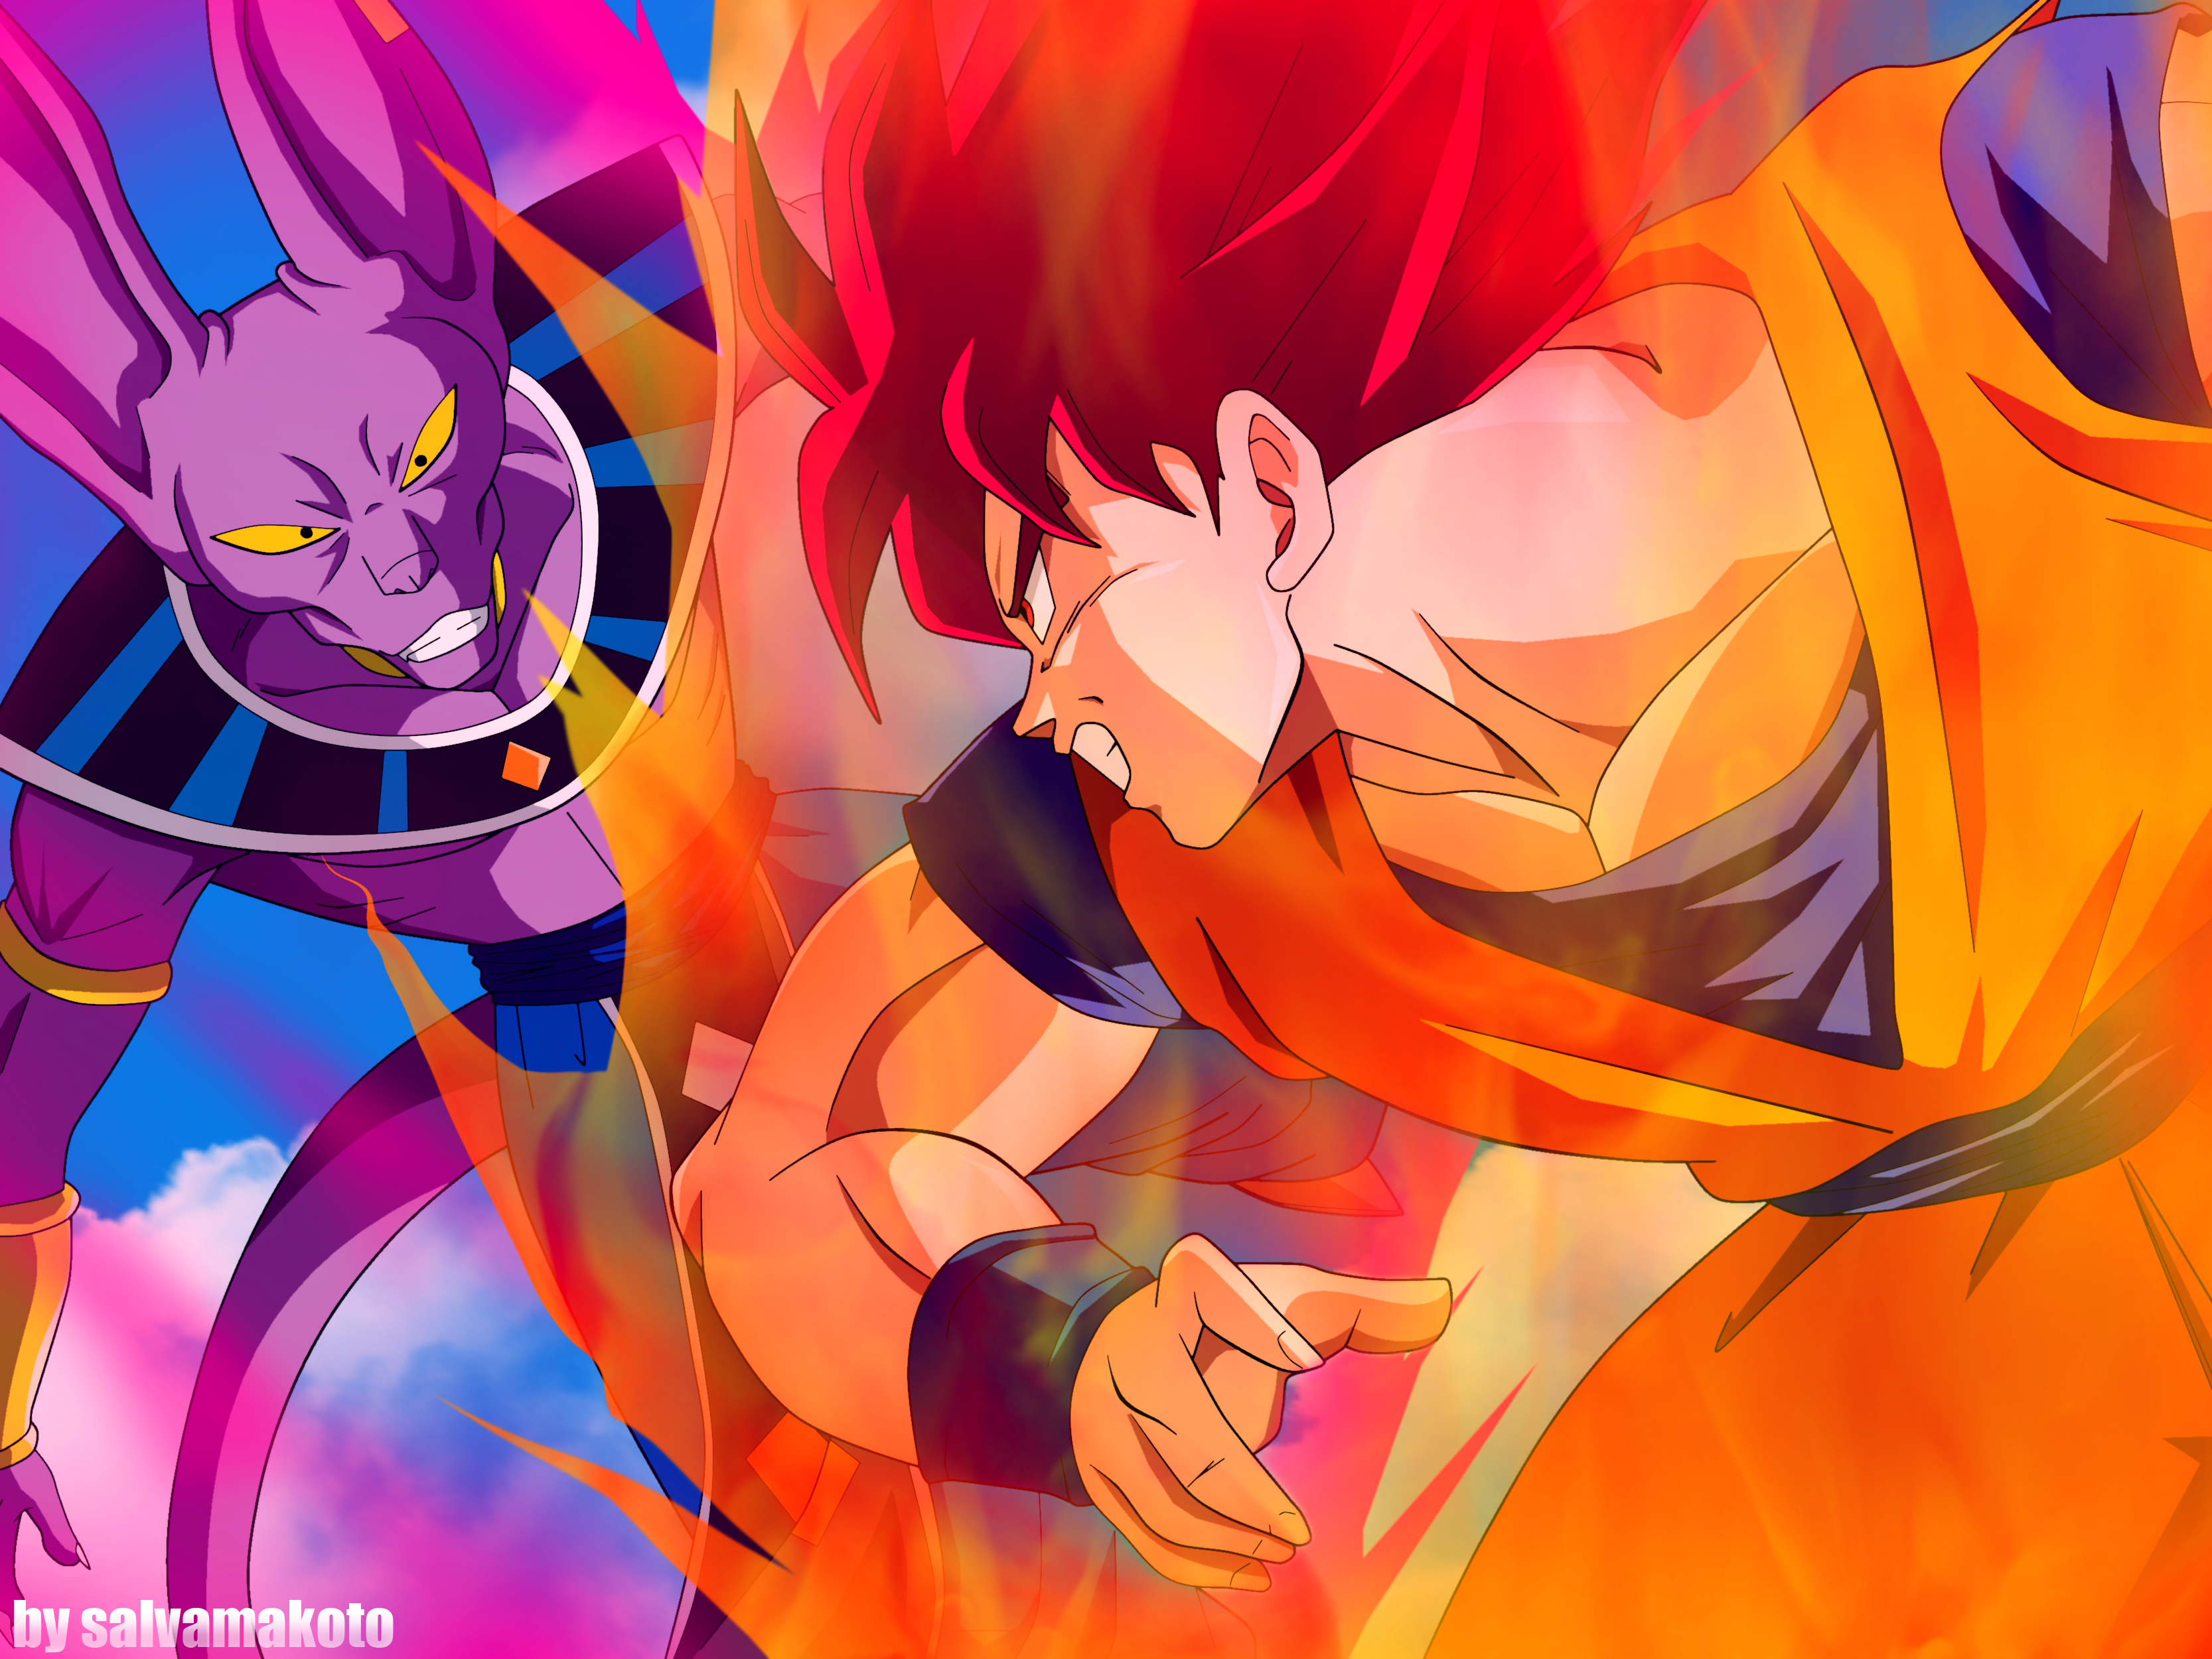 bills vs ssjgod by salvamakotoBills Vs Goku Gif